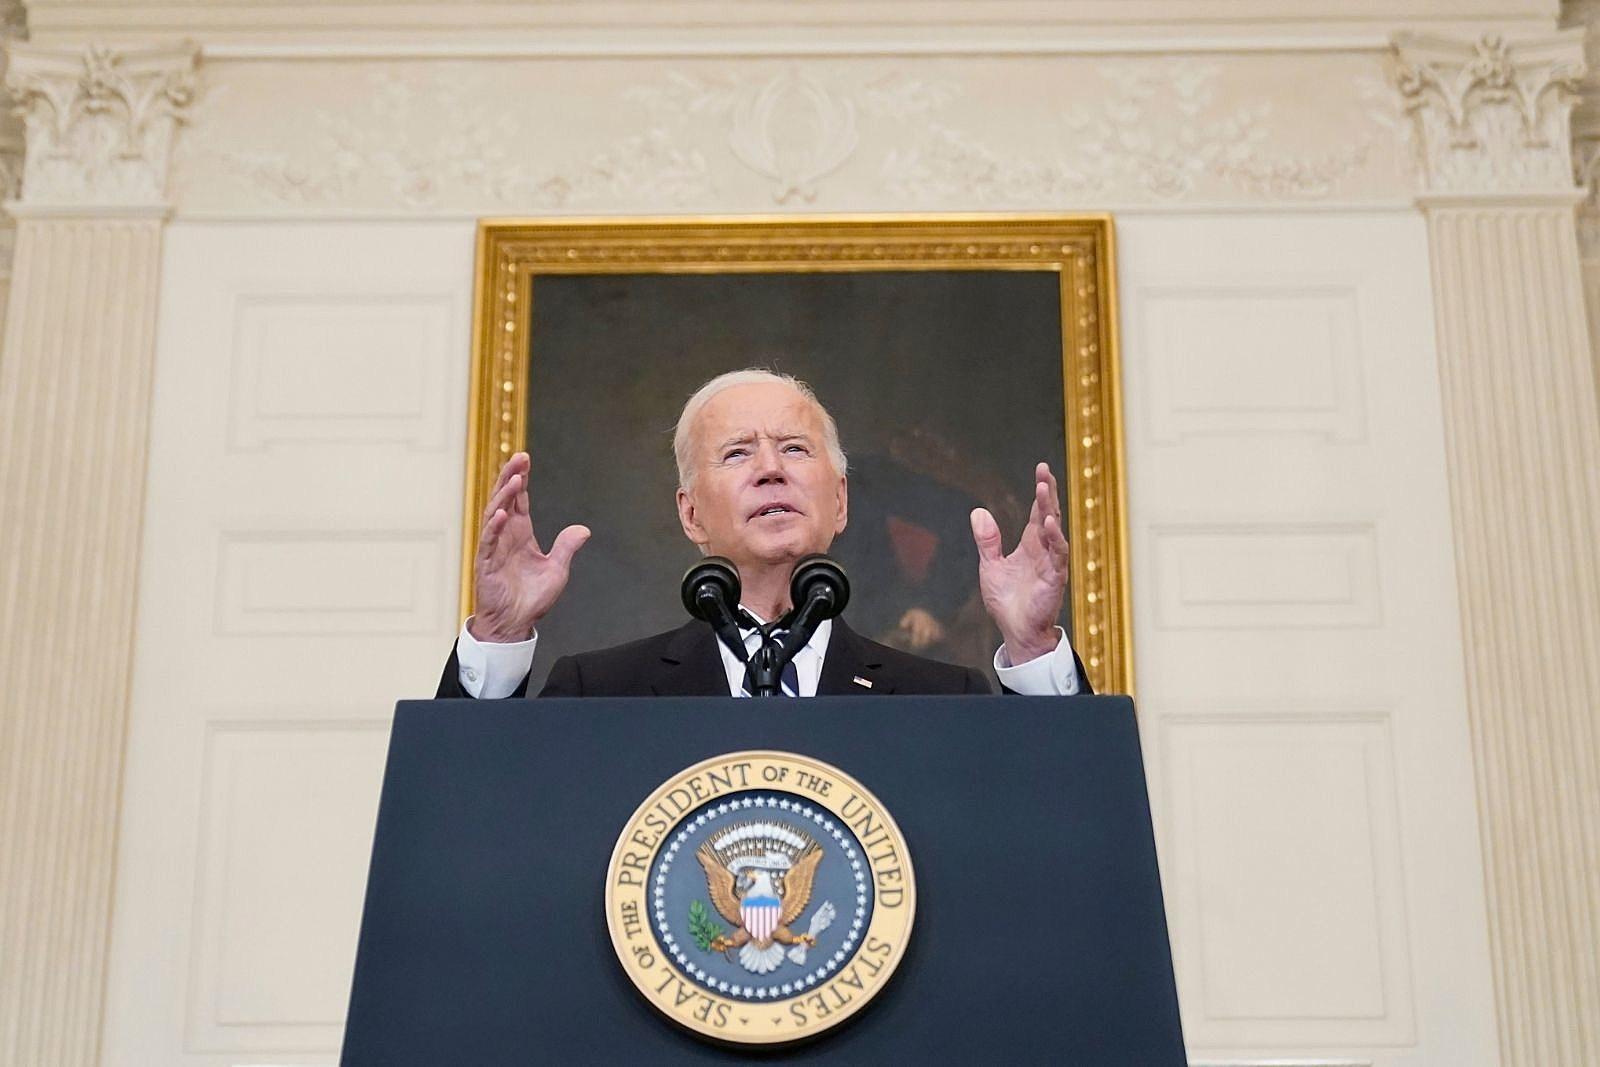 Biden announces new vaccine mandates for 100 million Americans